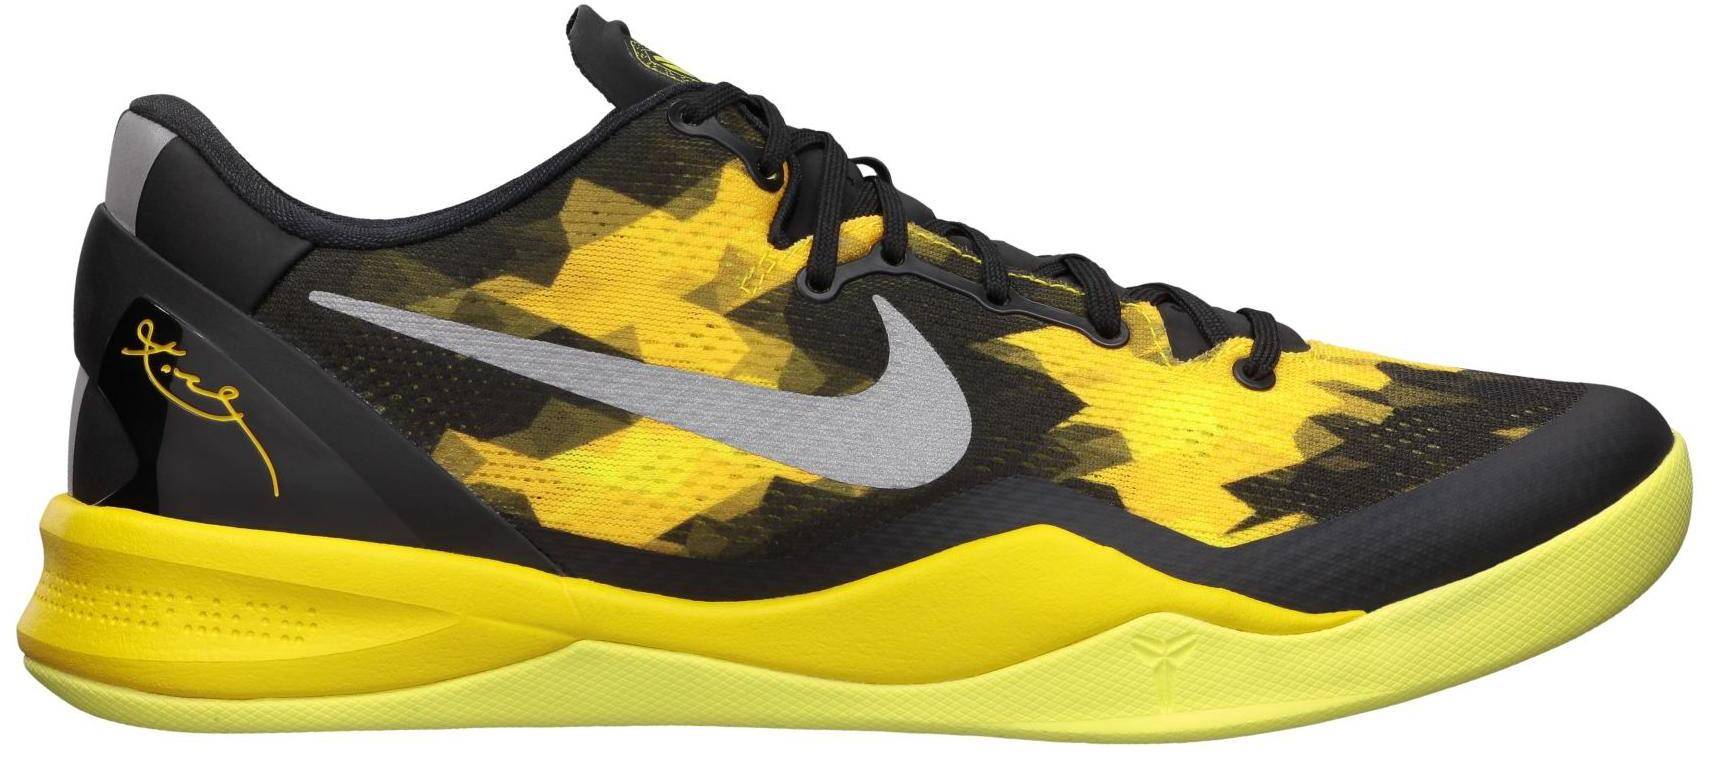 Nike Kobe 8 Sulfur / Electric - 555035-001